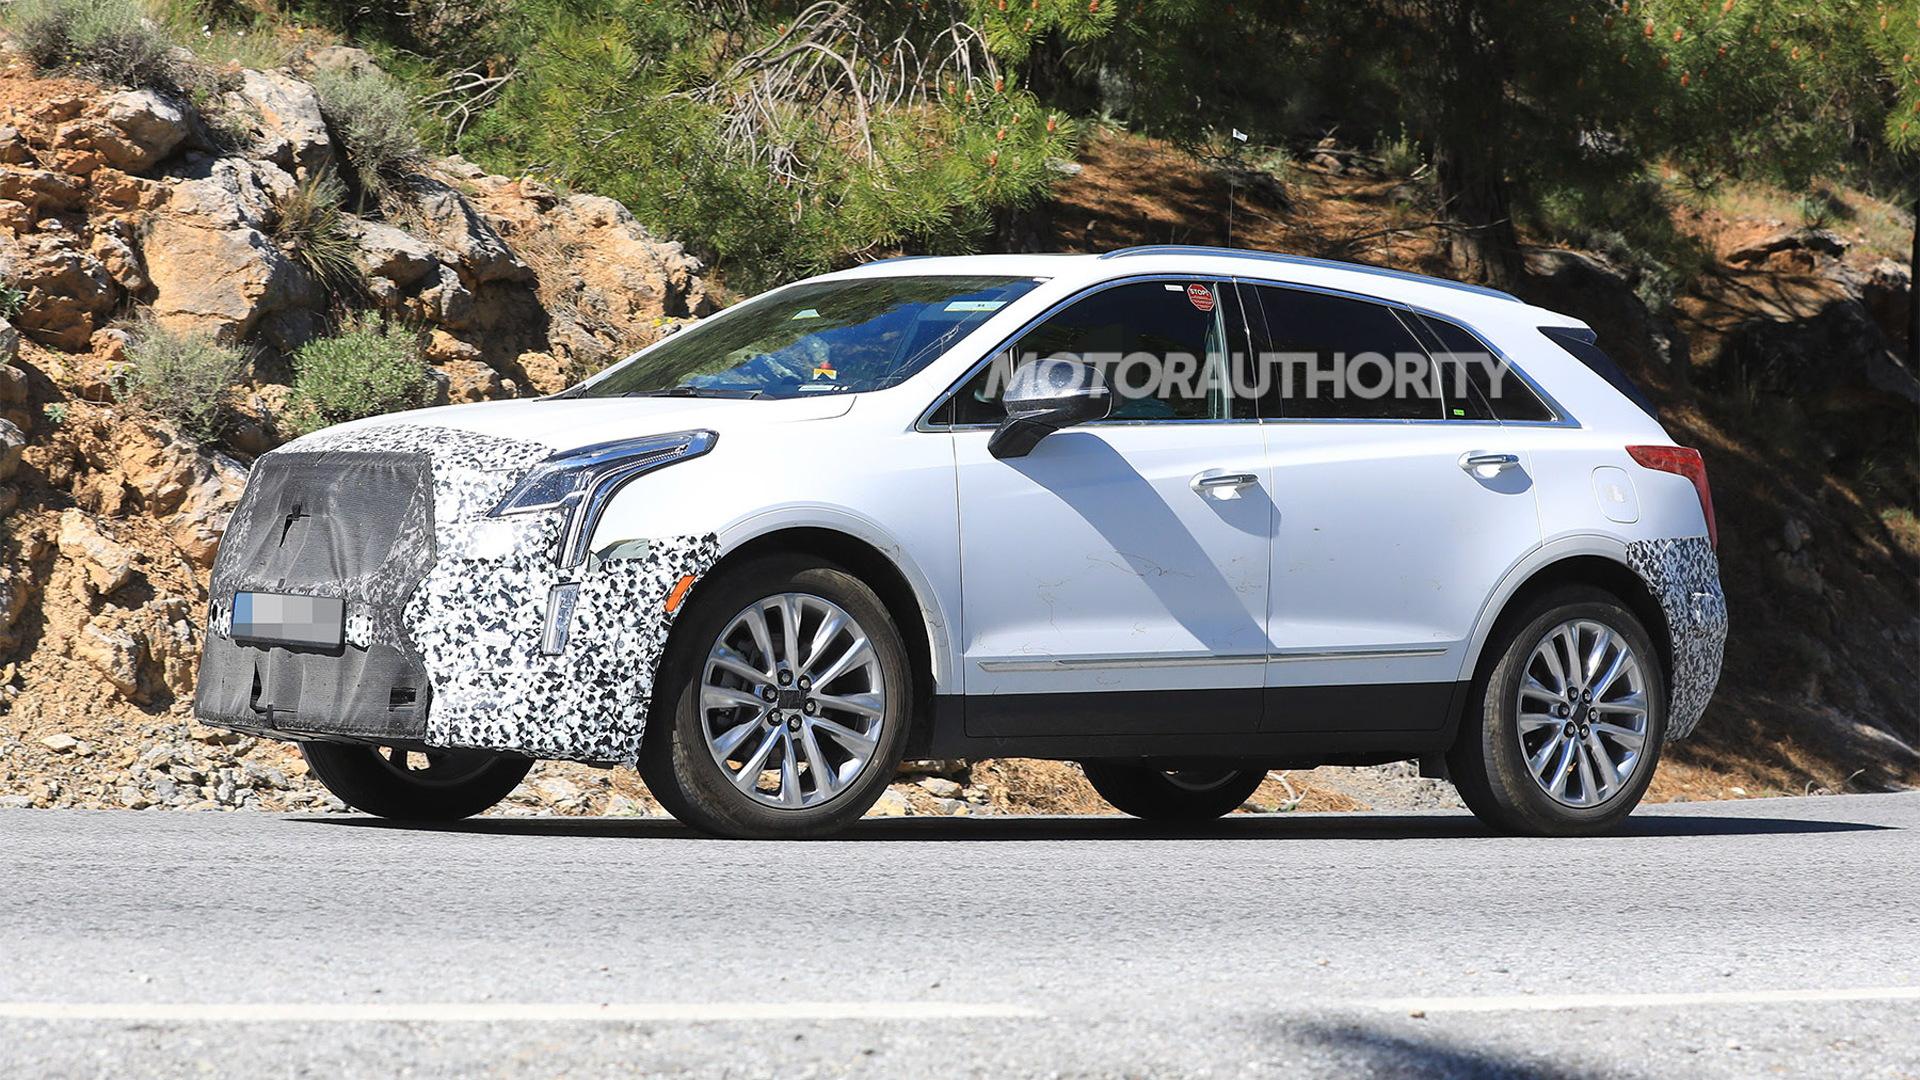 2020 Cadillac XT5 facelift spy shots - Image via S. Baldauf/SB-Medien